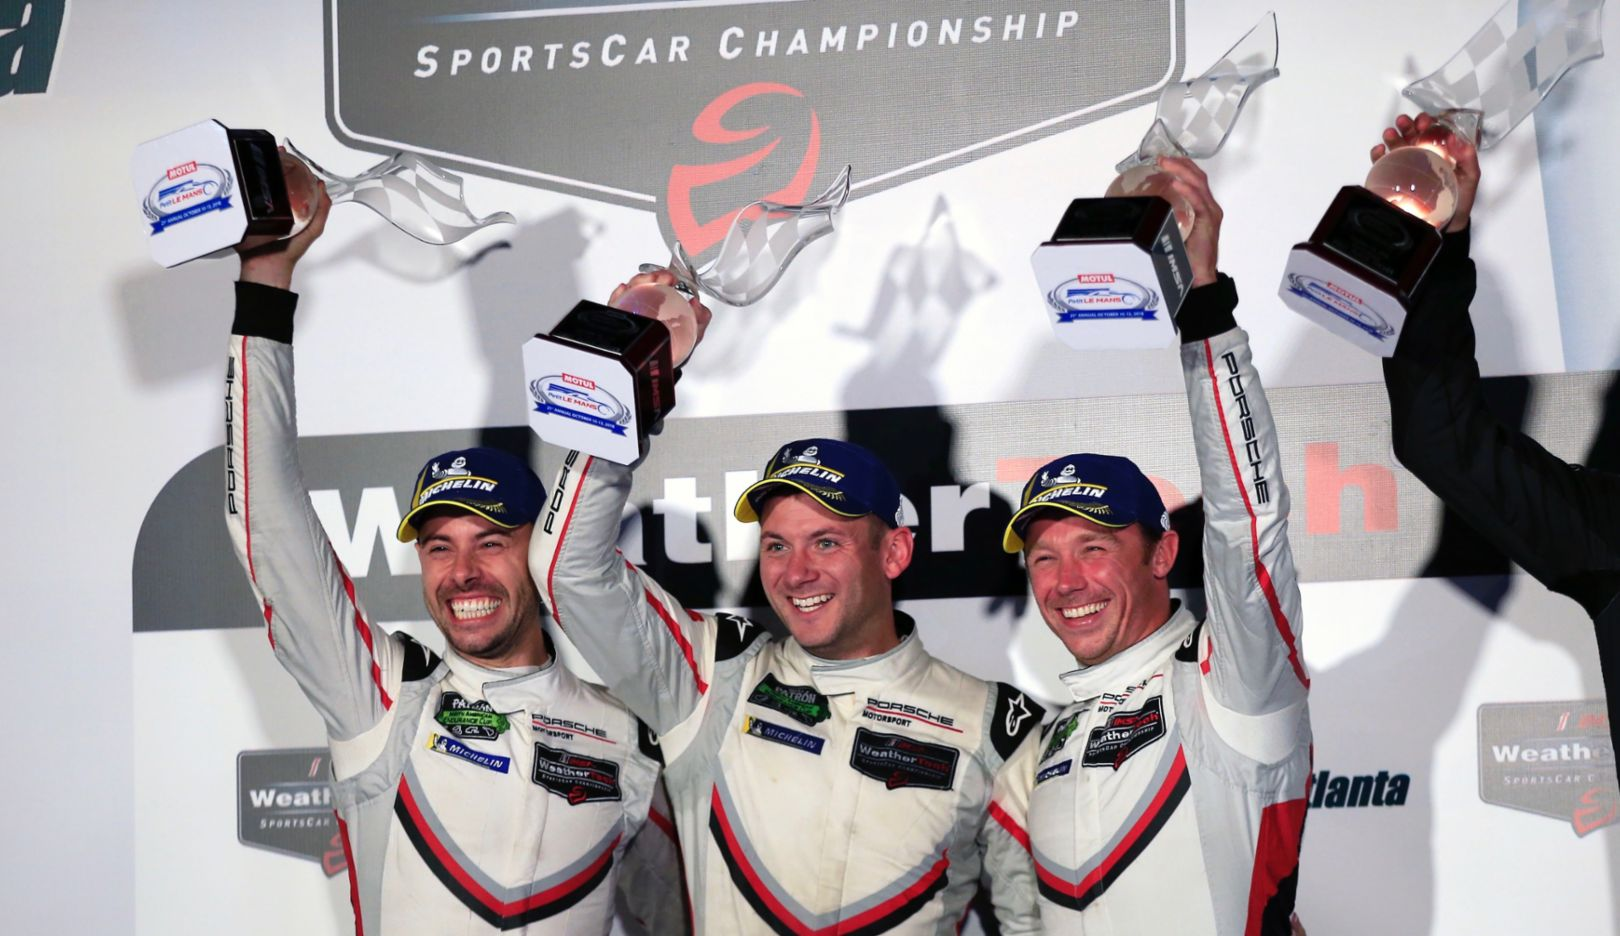 Frédéric Makowiecki, Nick Tandy, Patrick Pilet, l-r, Rennen, IMSA WeatherTech SportsCar Championship, Braselton, 2018, Porsche AG